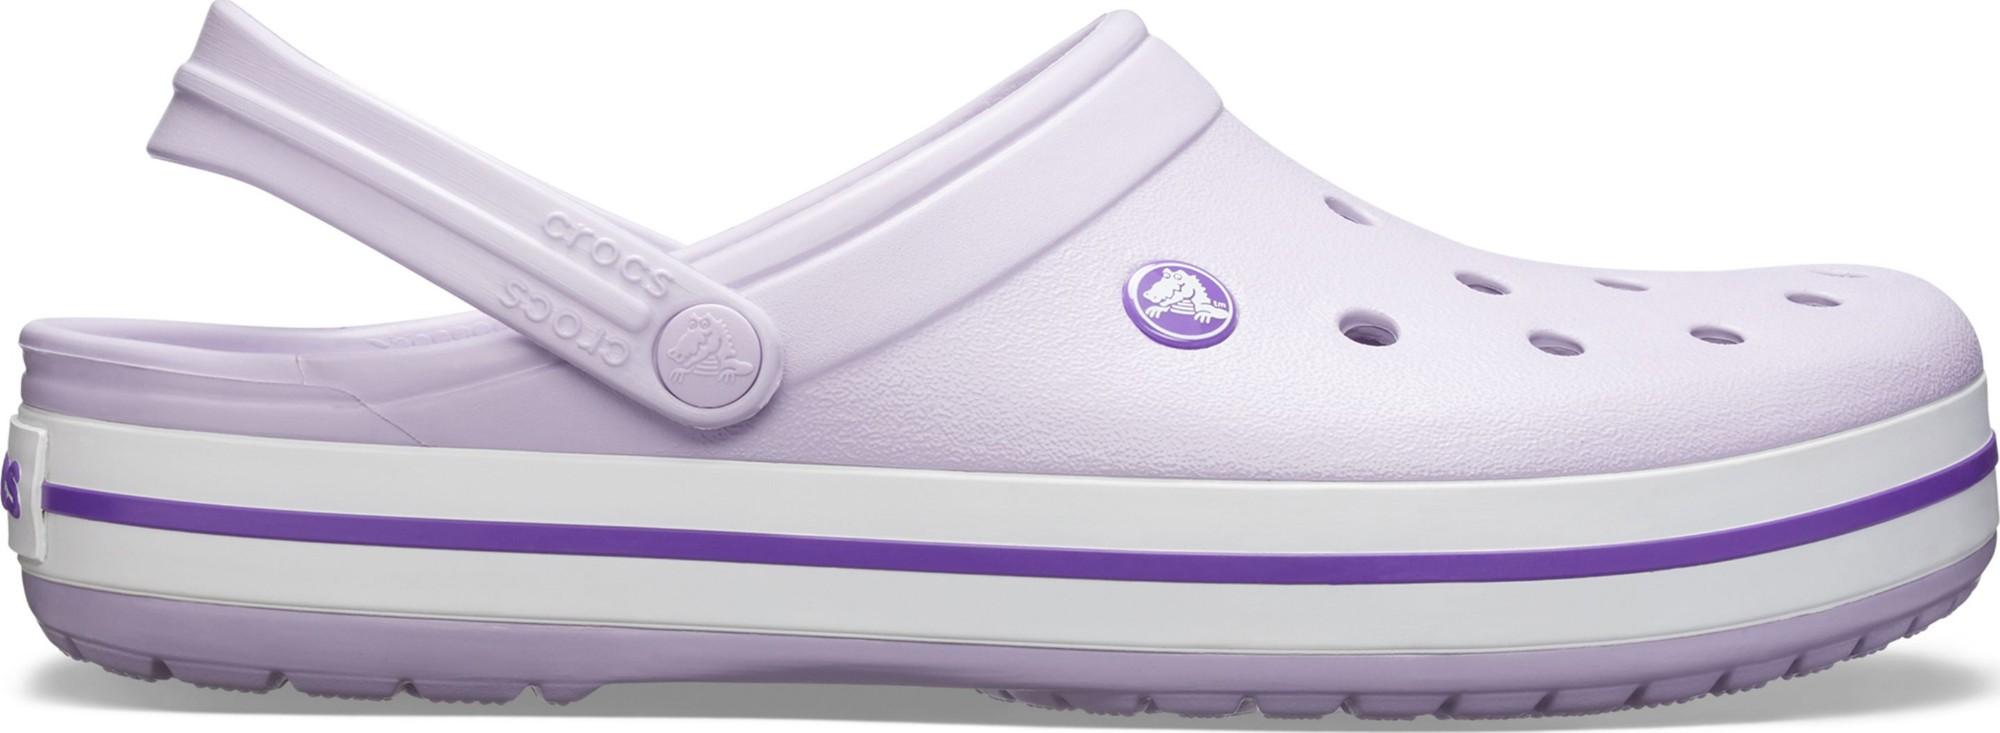 Crocs™ Crocband™ Lavender/Purple 36,5